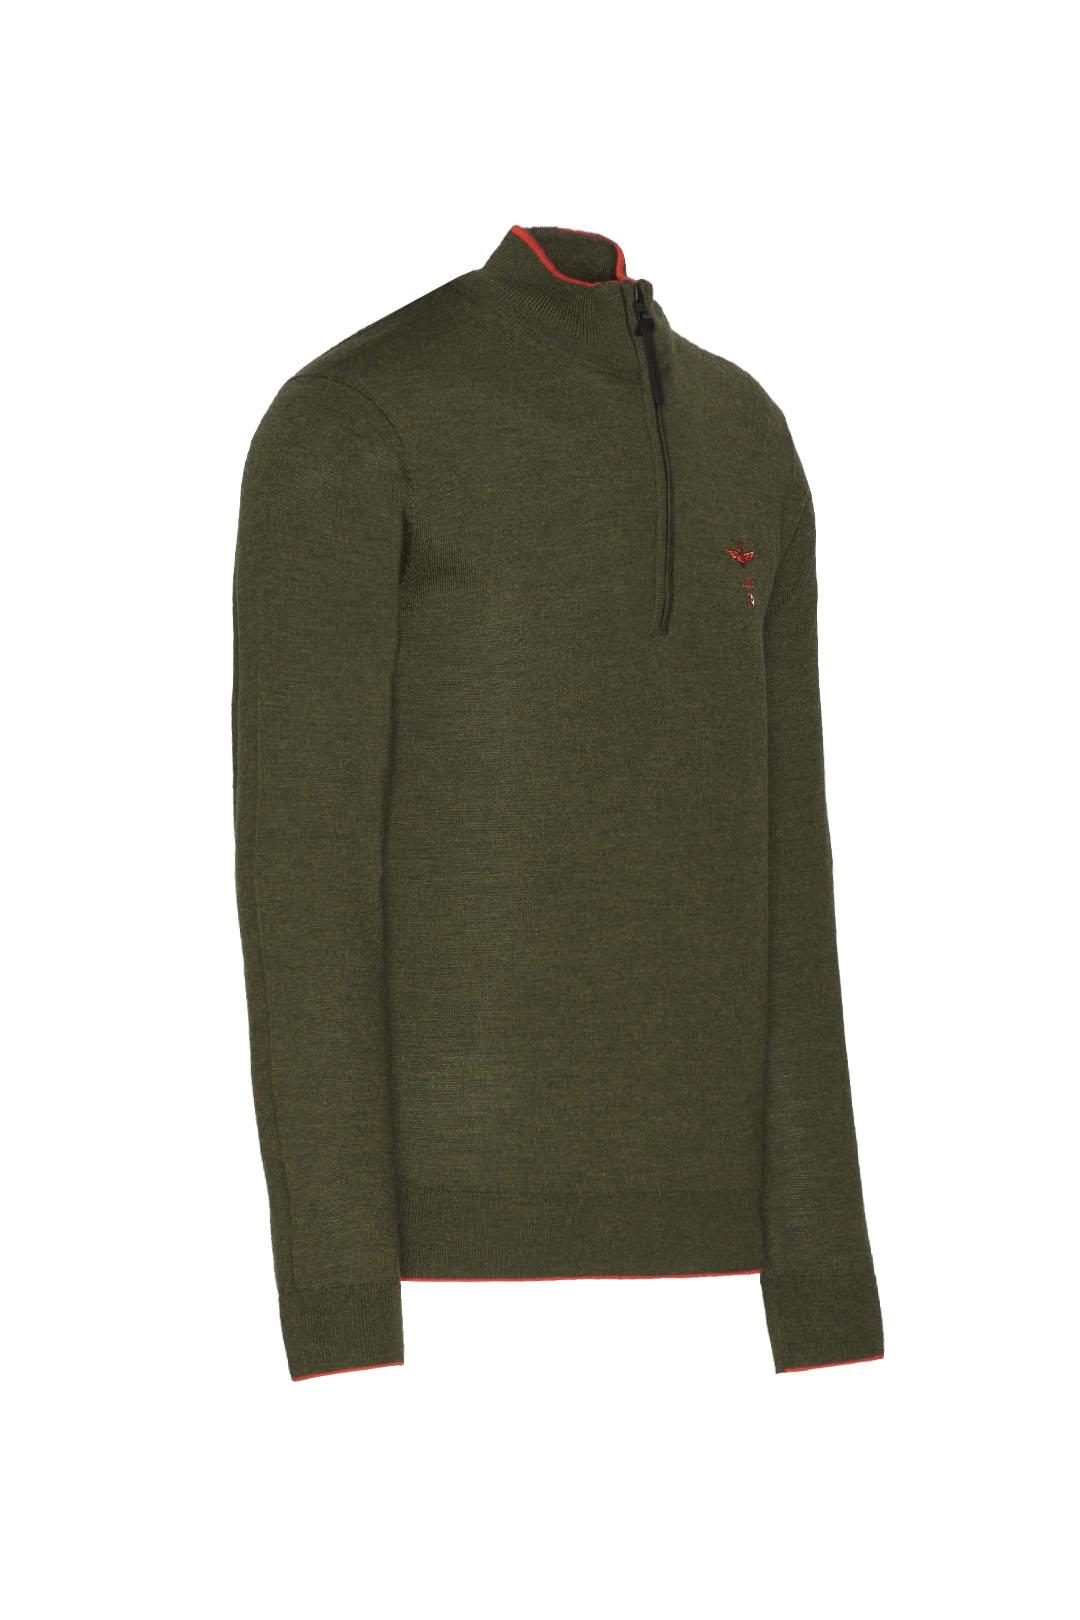 Pullover aus Merino Wolle                3